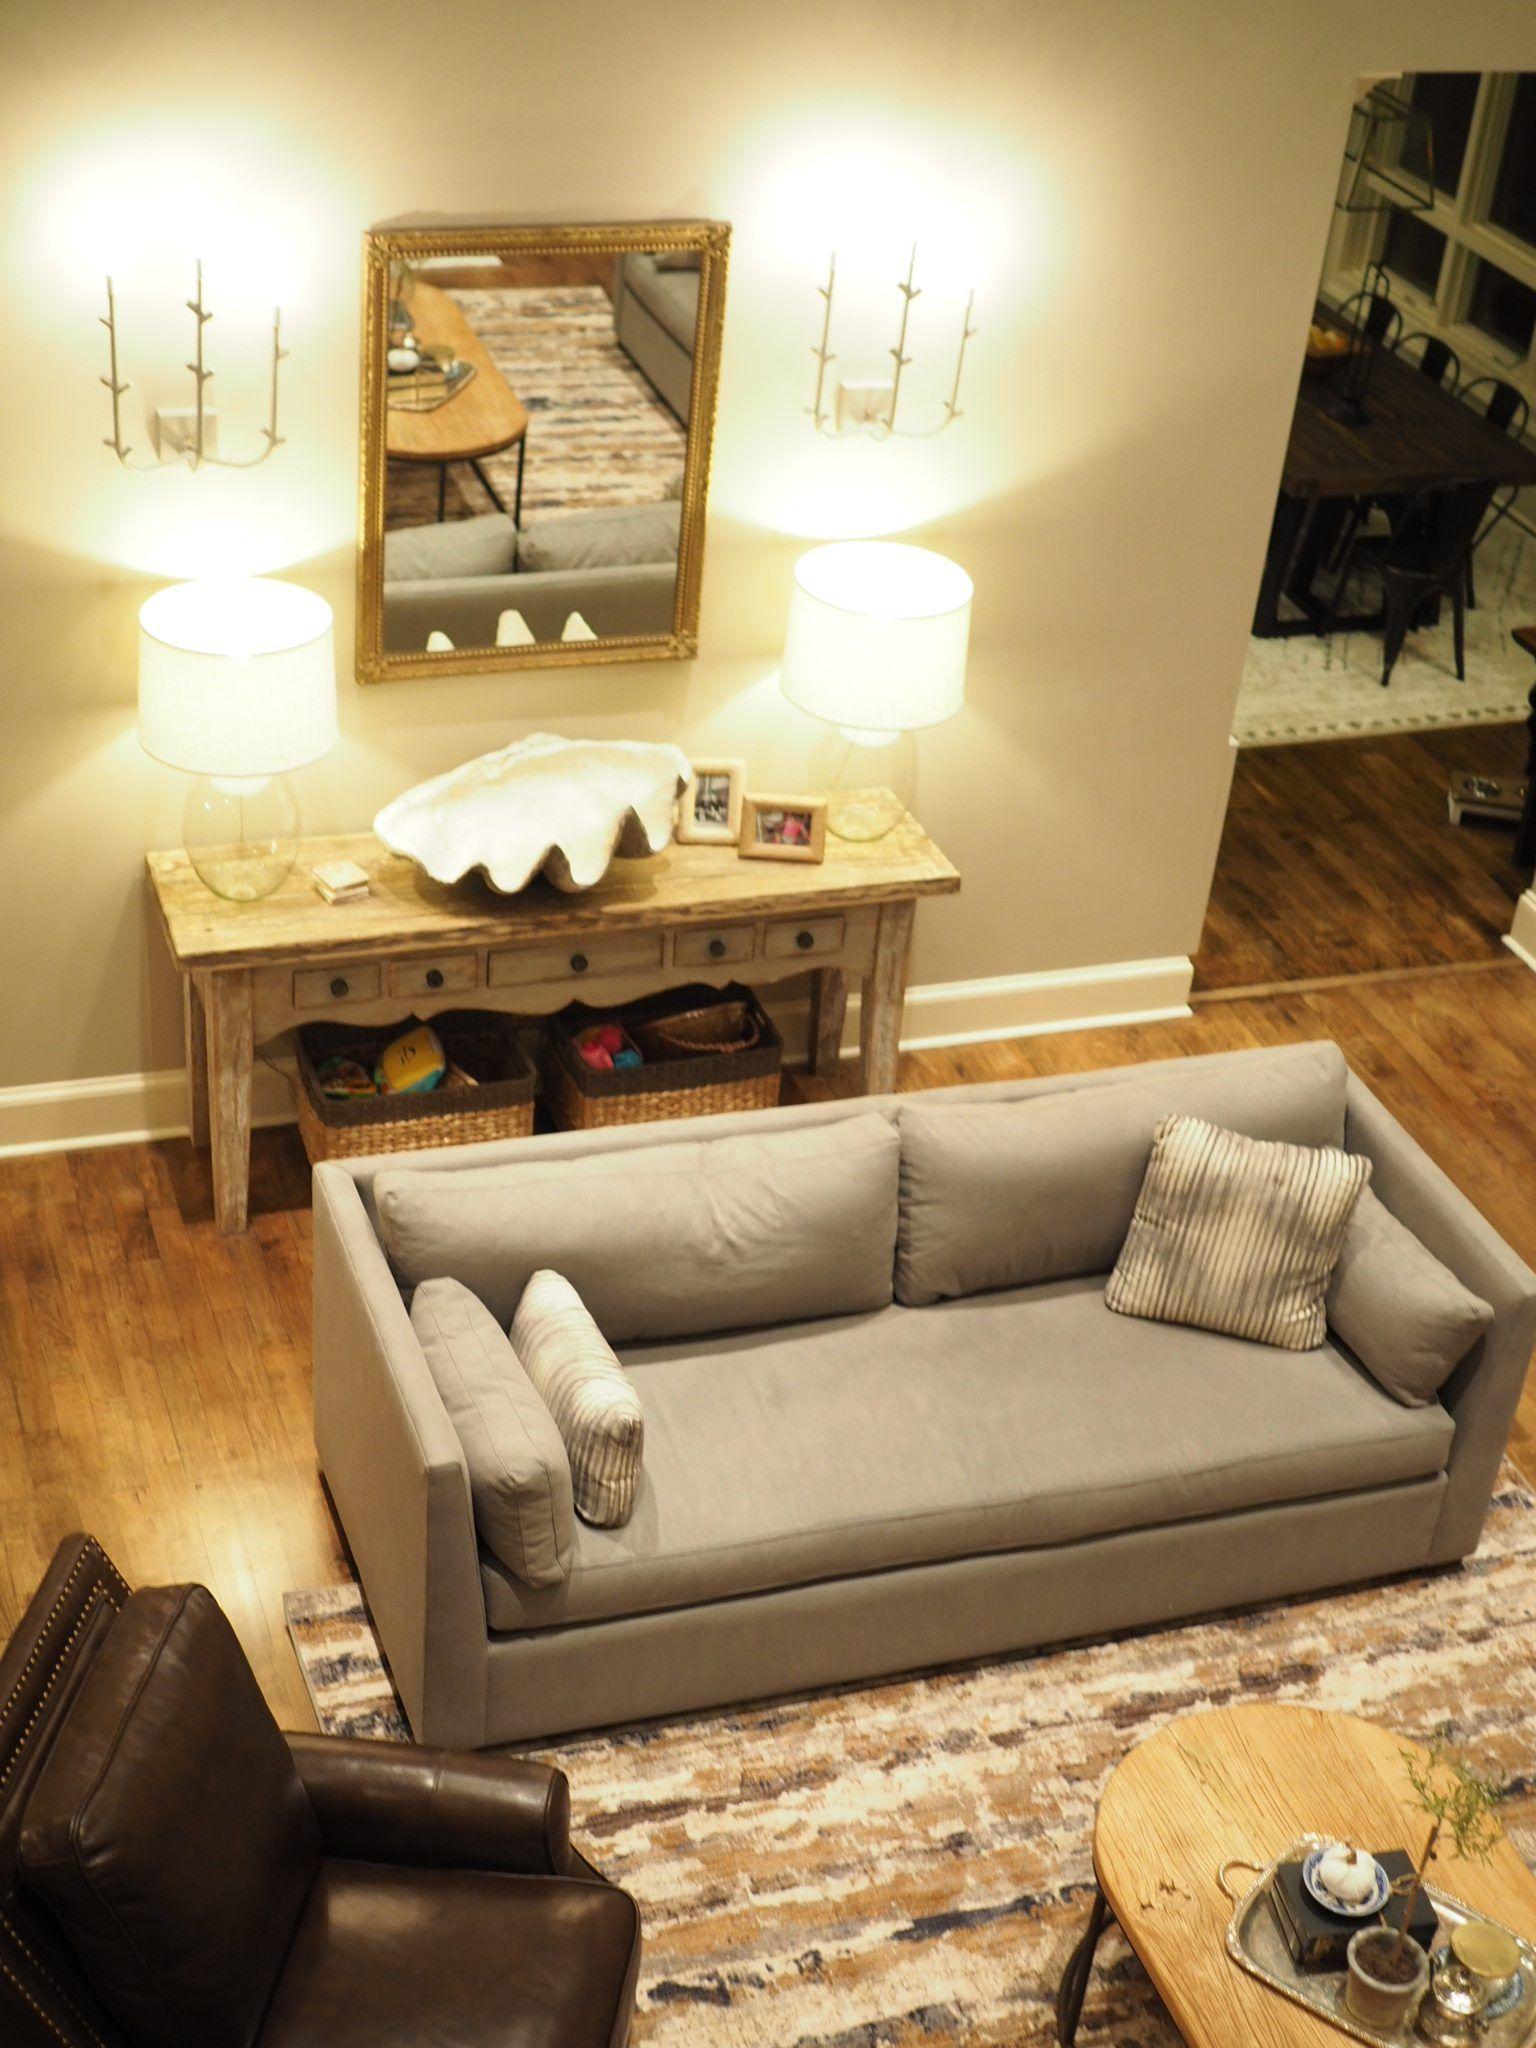 How To Arrange Furniture Around An Area Rug Furniture Furniture Arrangement Area Rugs